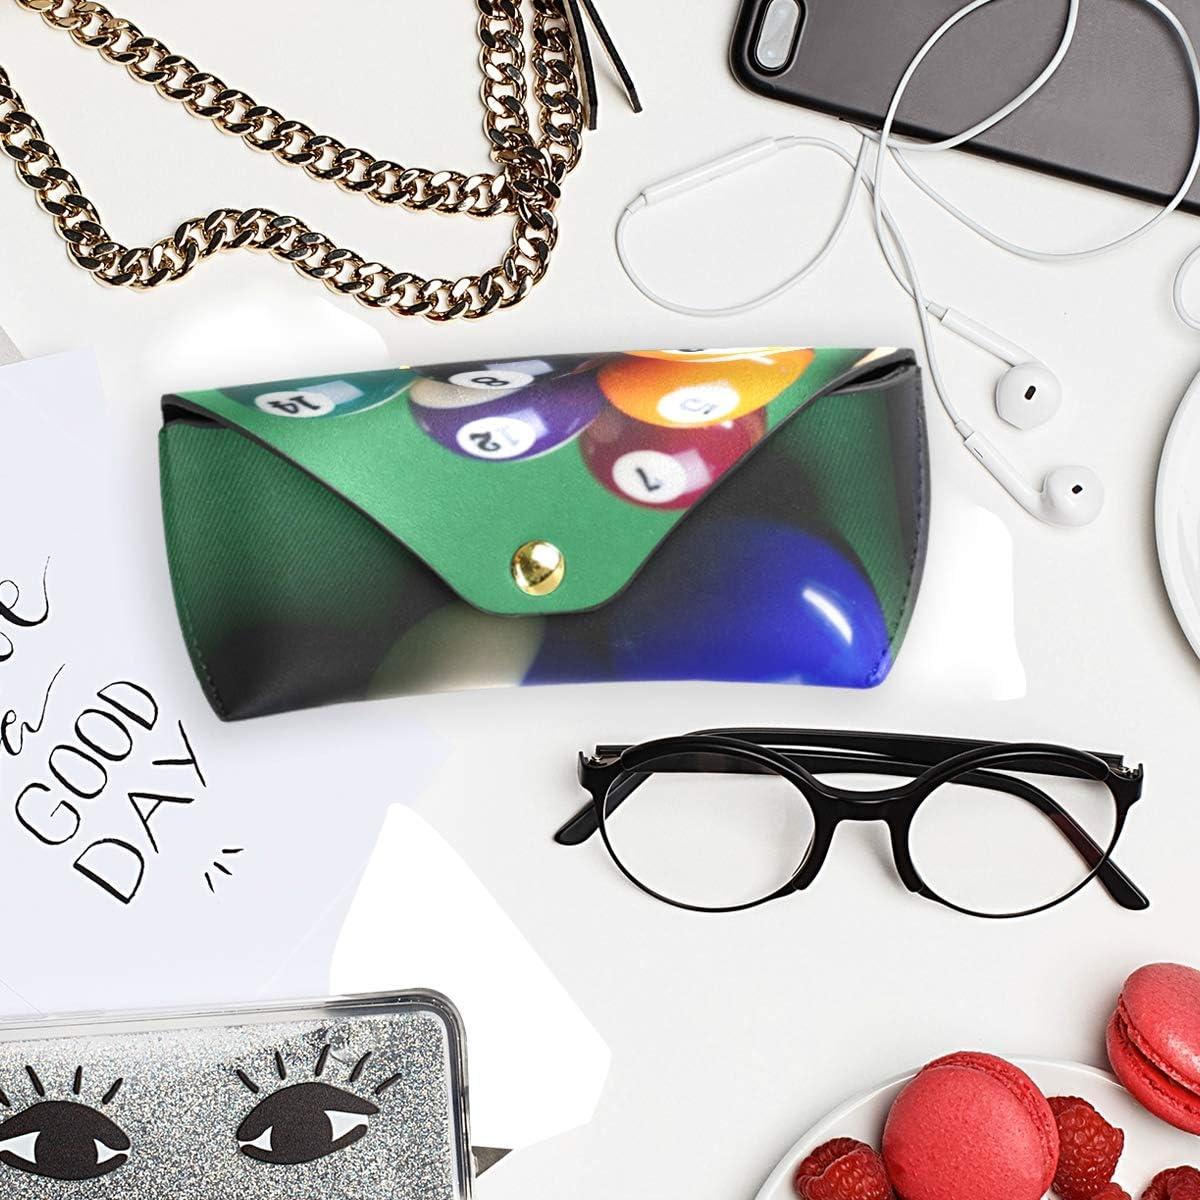 Multiuse Goggles Bag Billiard Balls Portable Sunglasses Case Eyeglasses Pouch Holder PU Leather